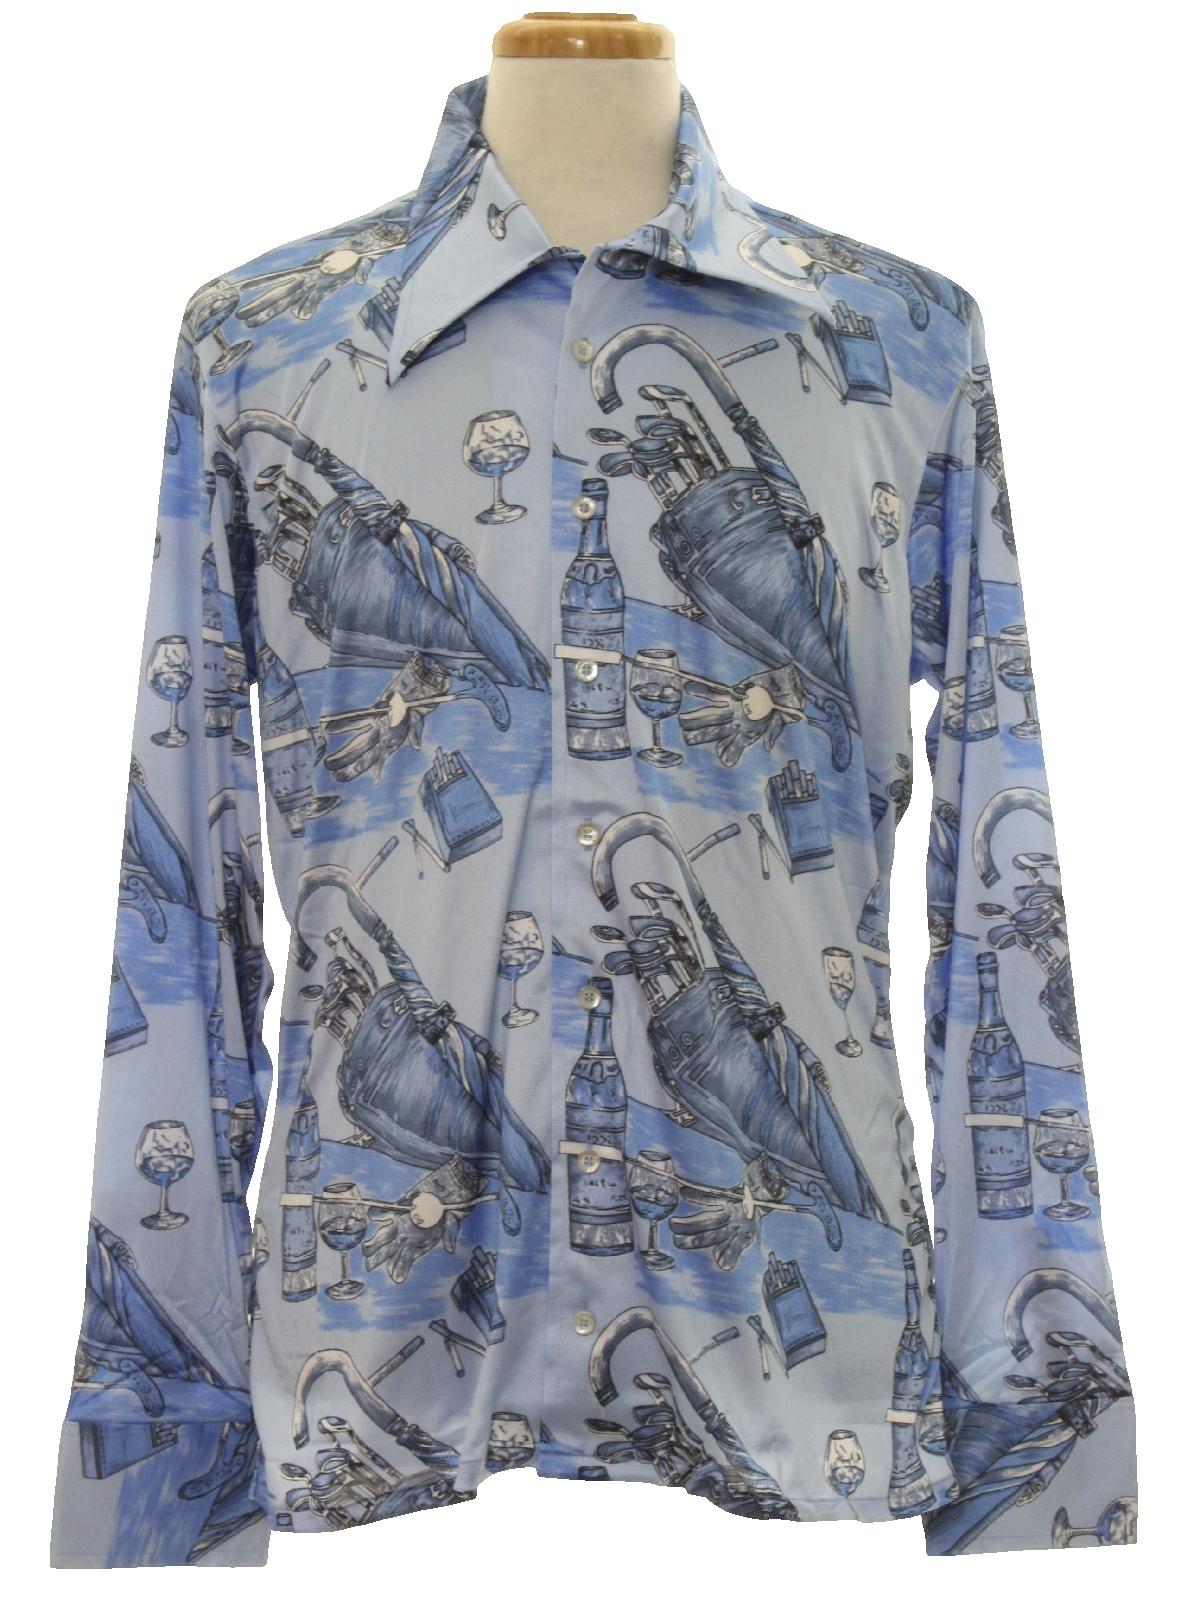 1970s Oleg Cassini By Burma Designer Print Disco Shirt